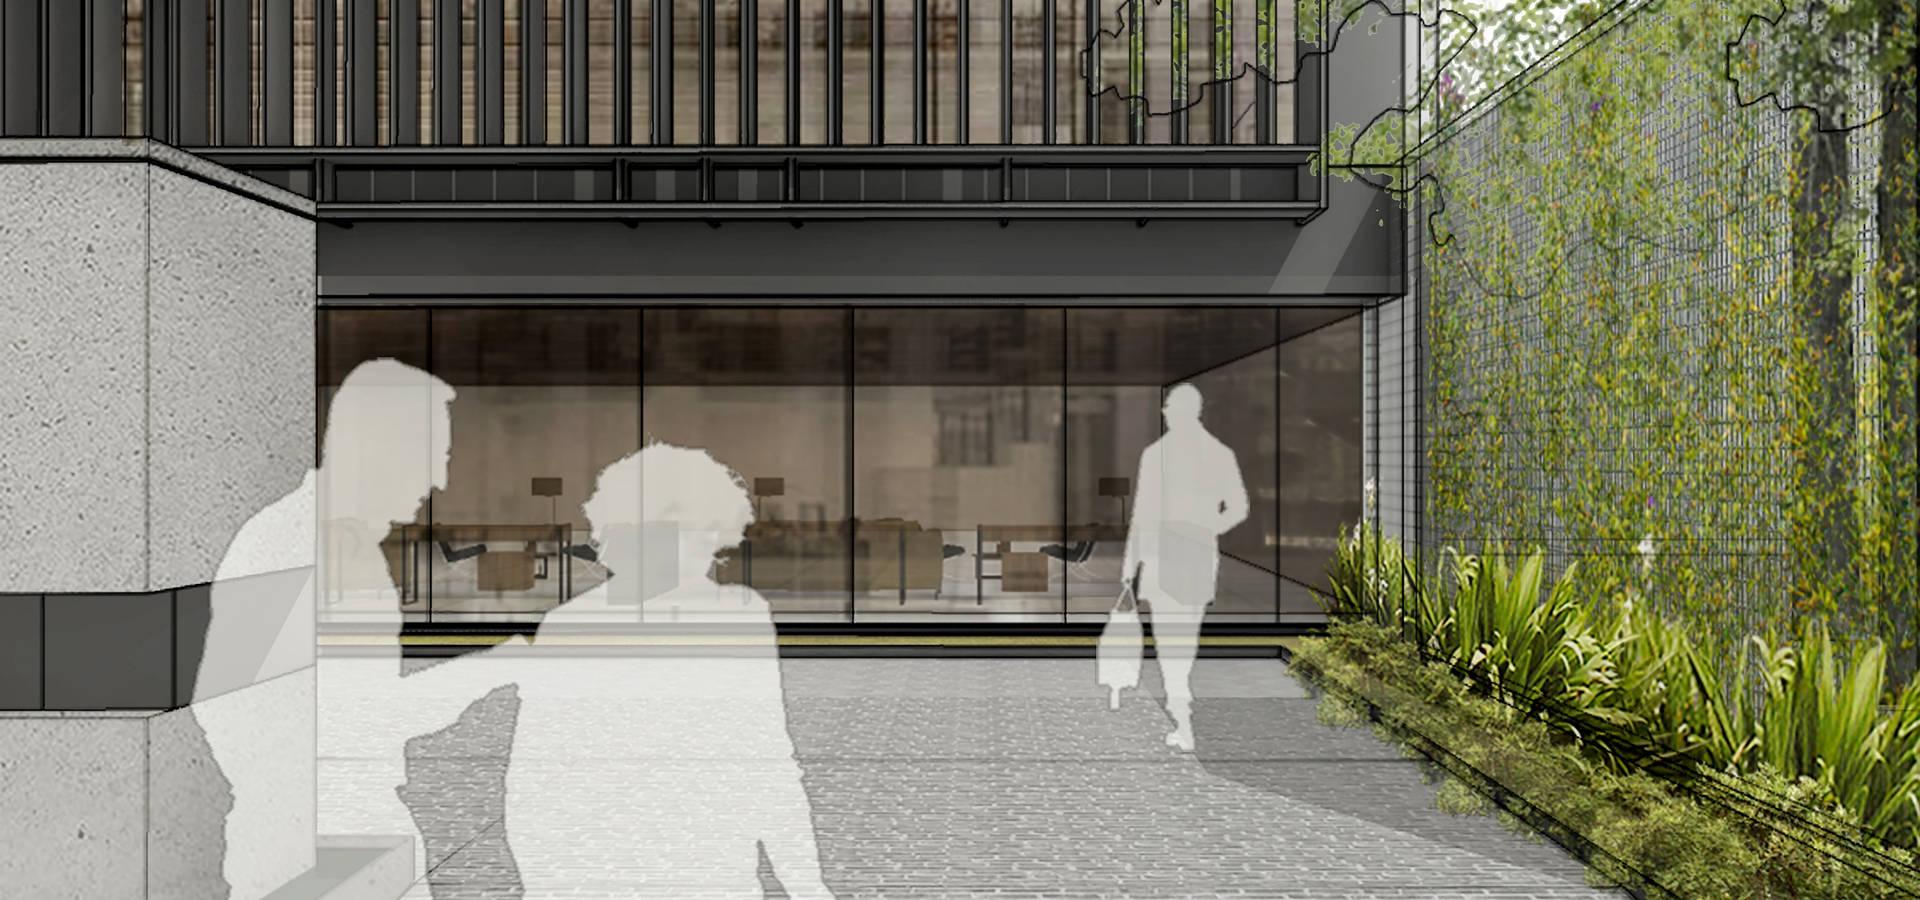 STUDIOGRA/PH ARCHITECTS